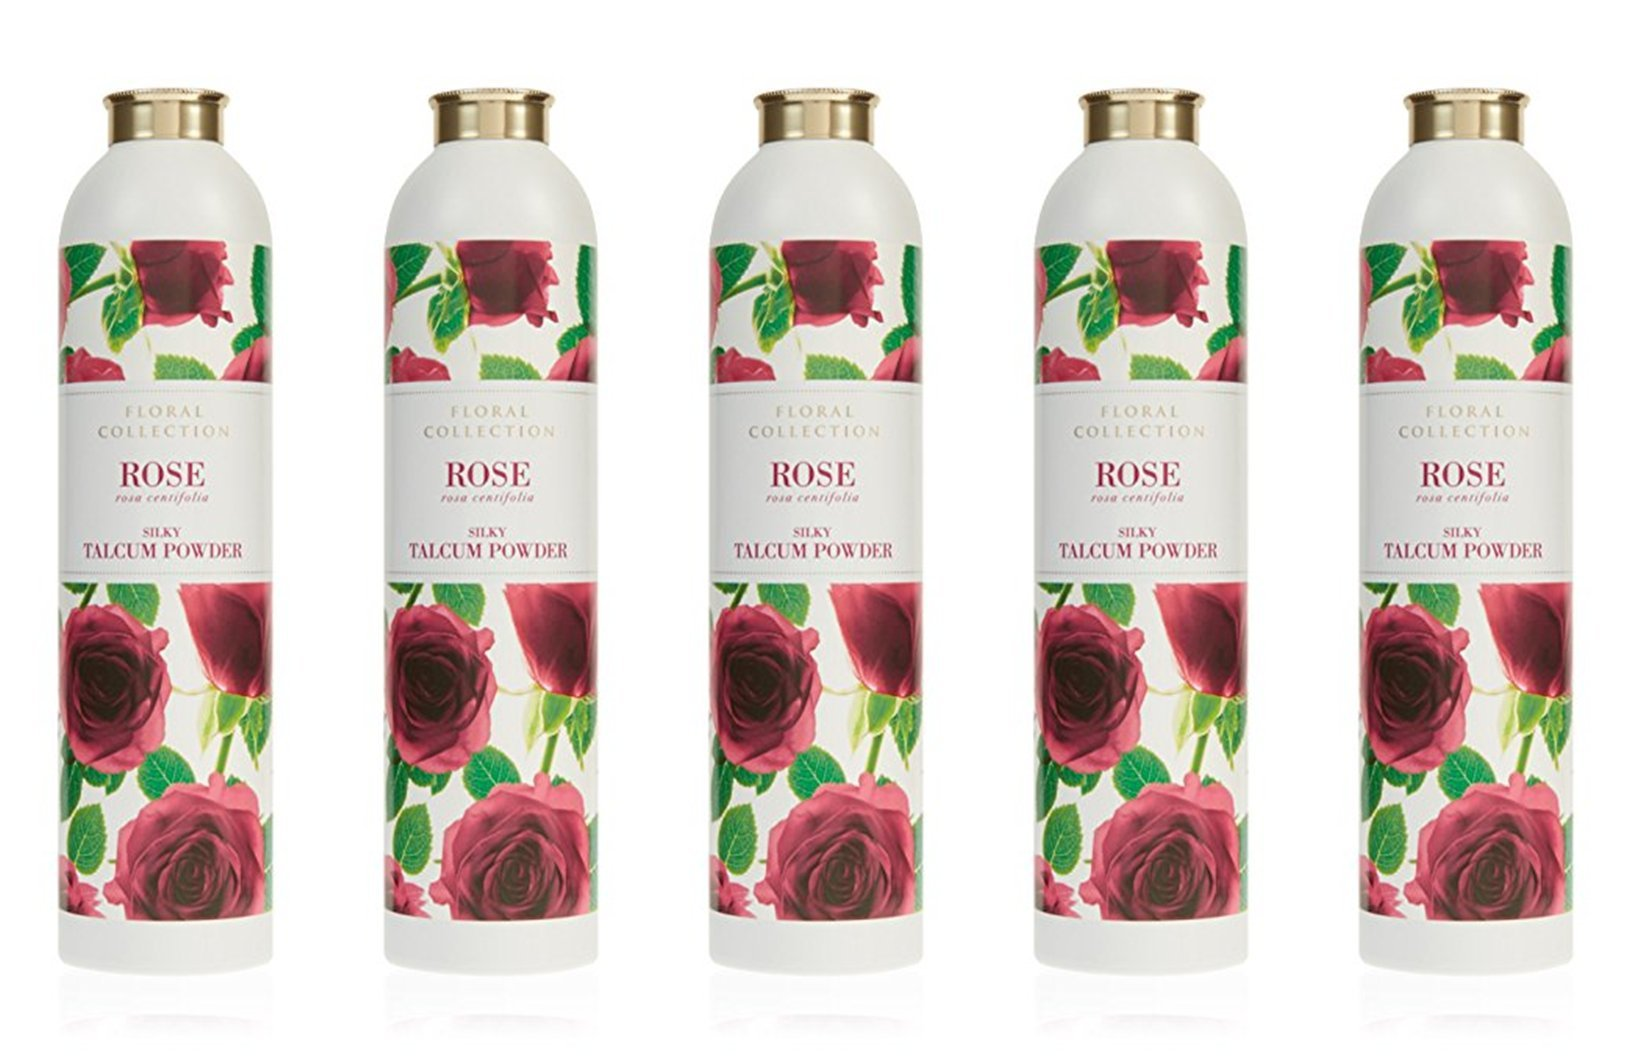 MARKS & SPENCER Rose Talcum Powder 200 g. (5 Pack)